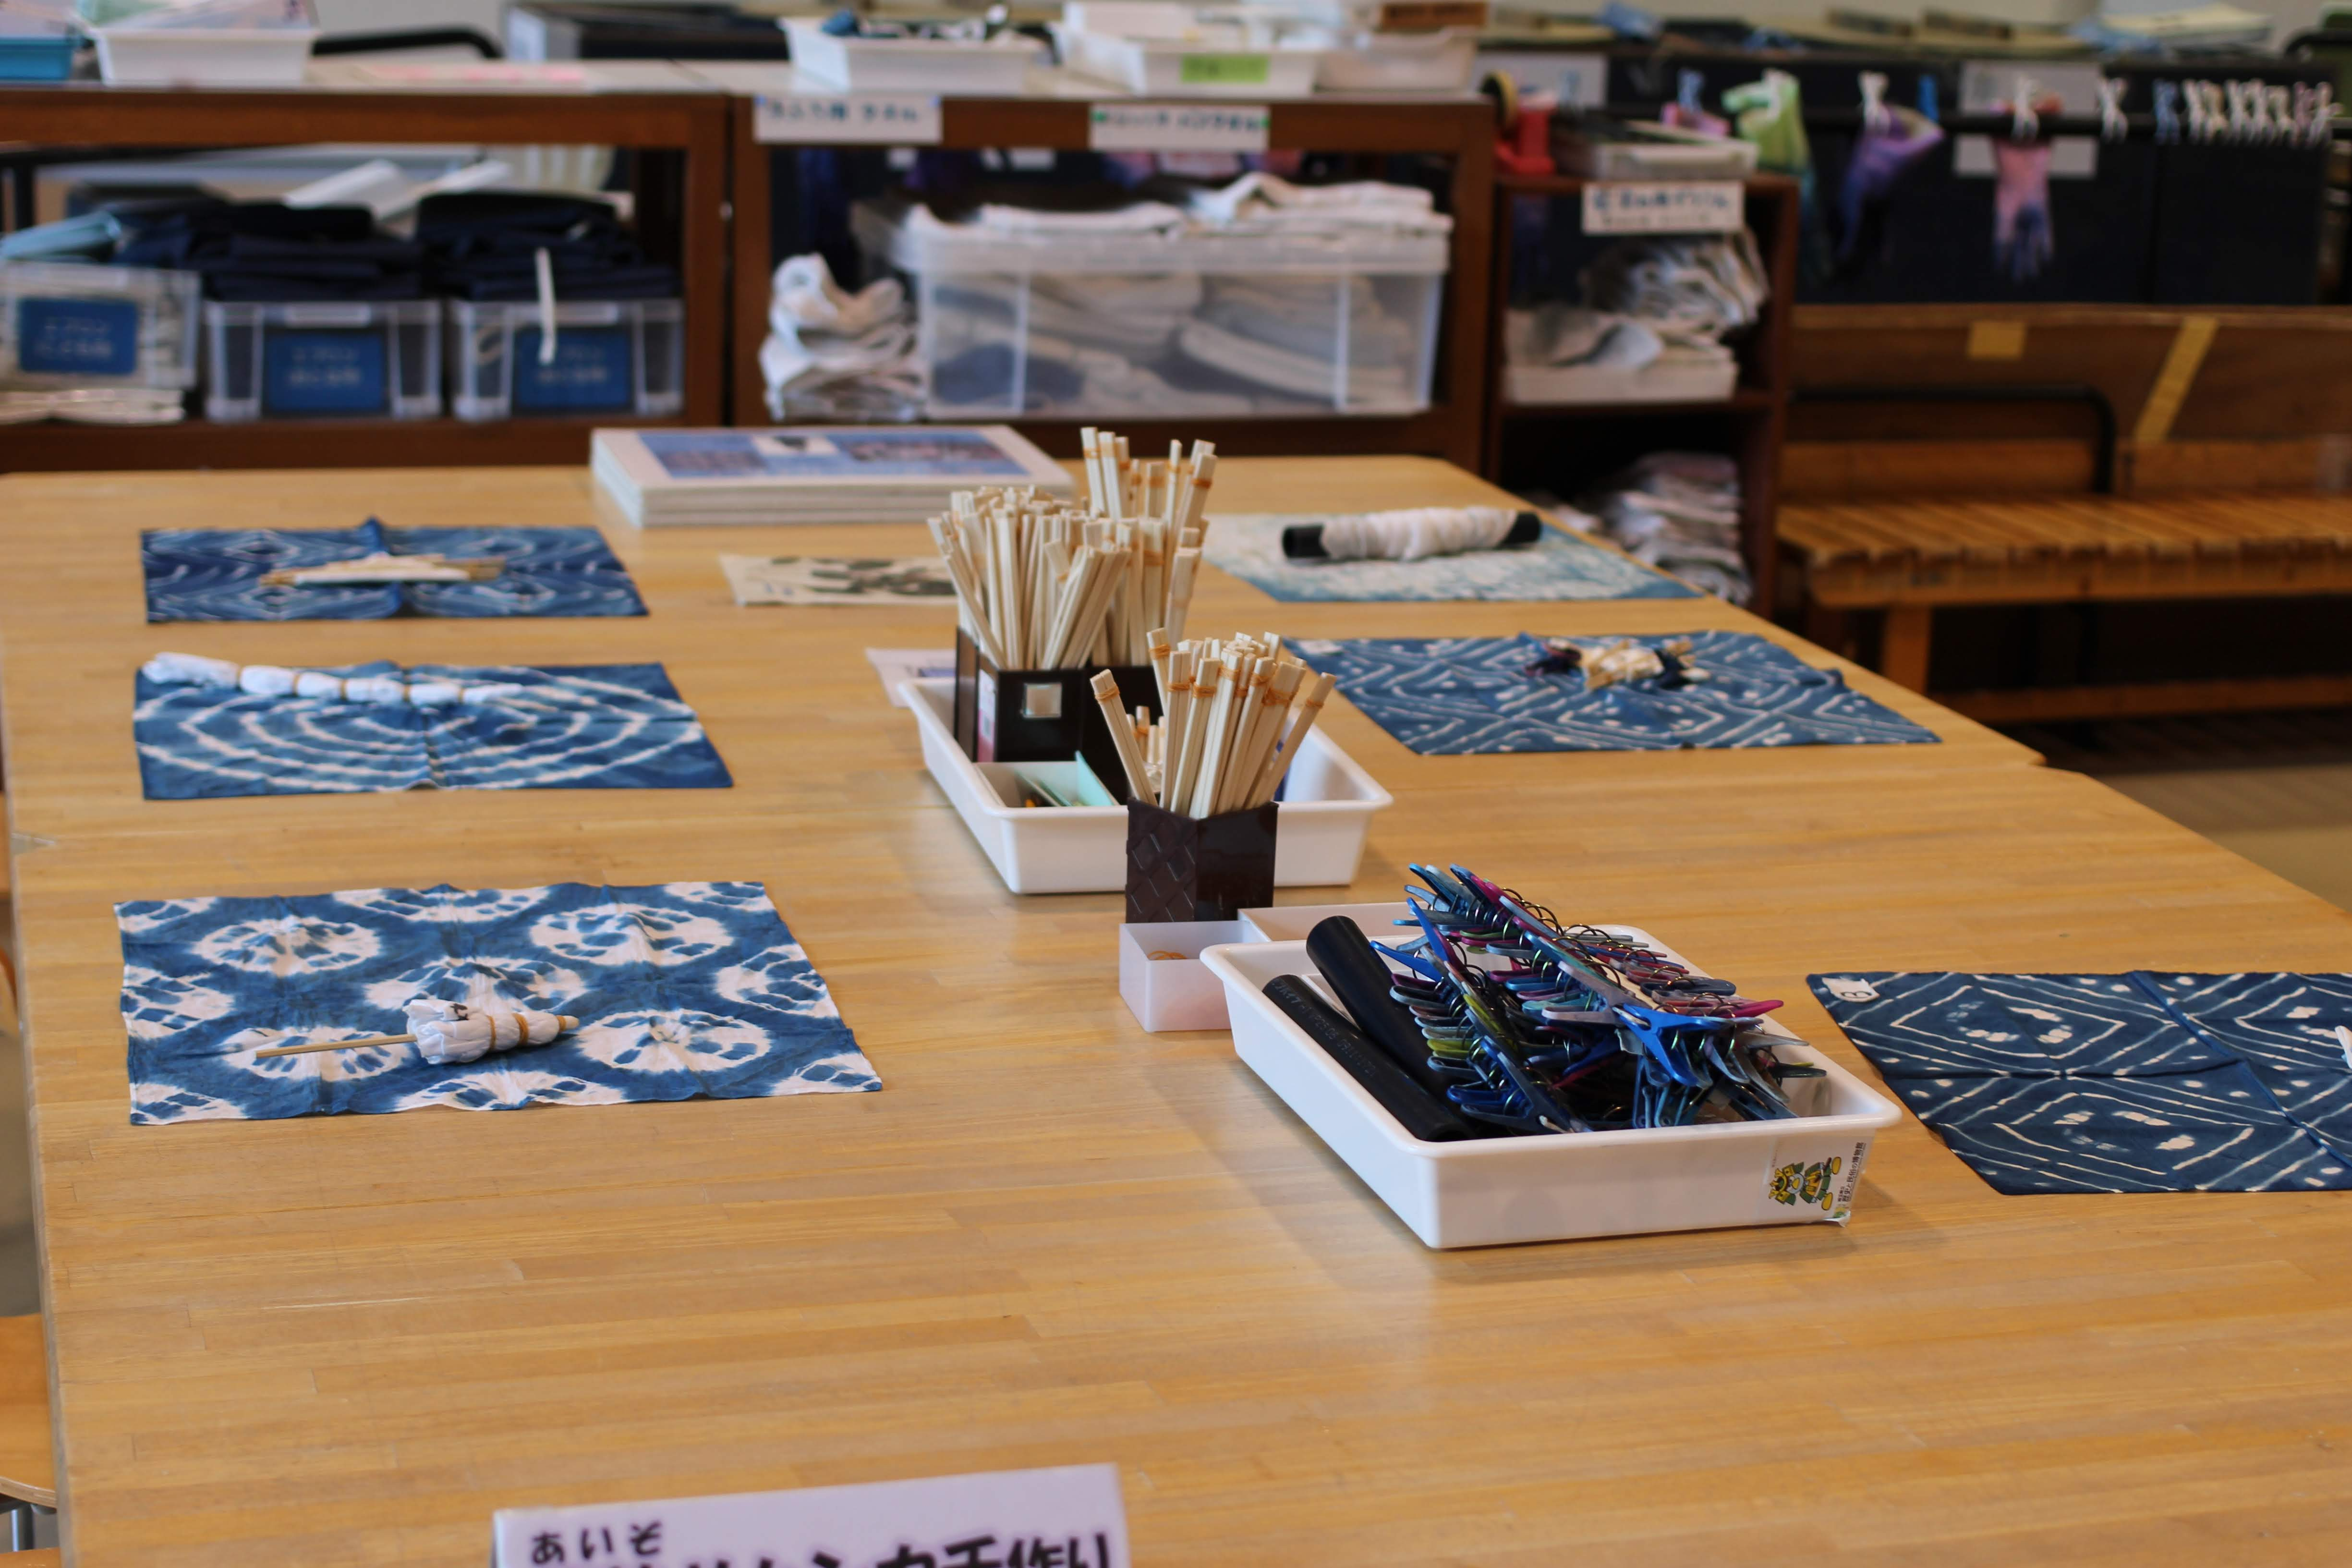 Tye dye craft at Saitama History and folklore museum in omiya Park